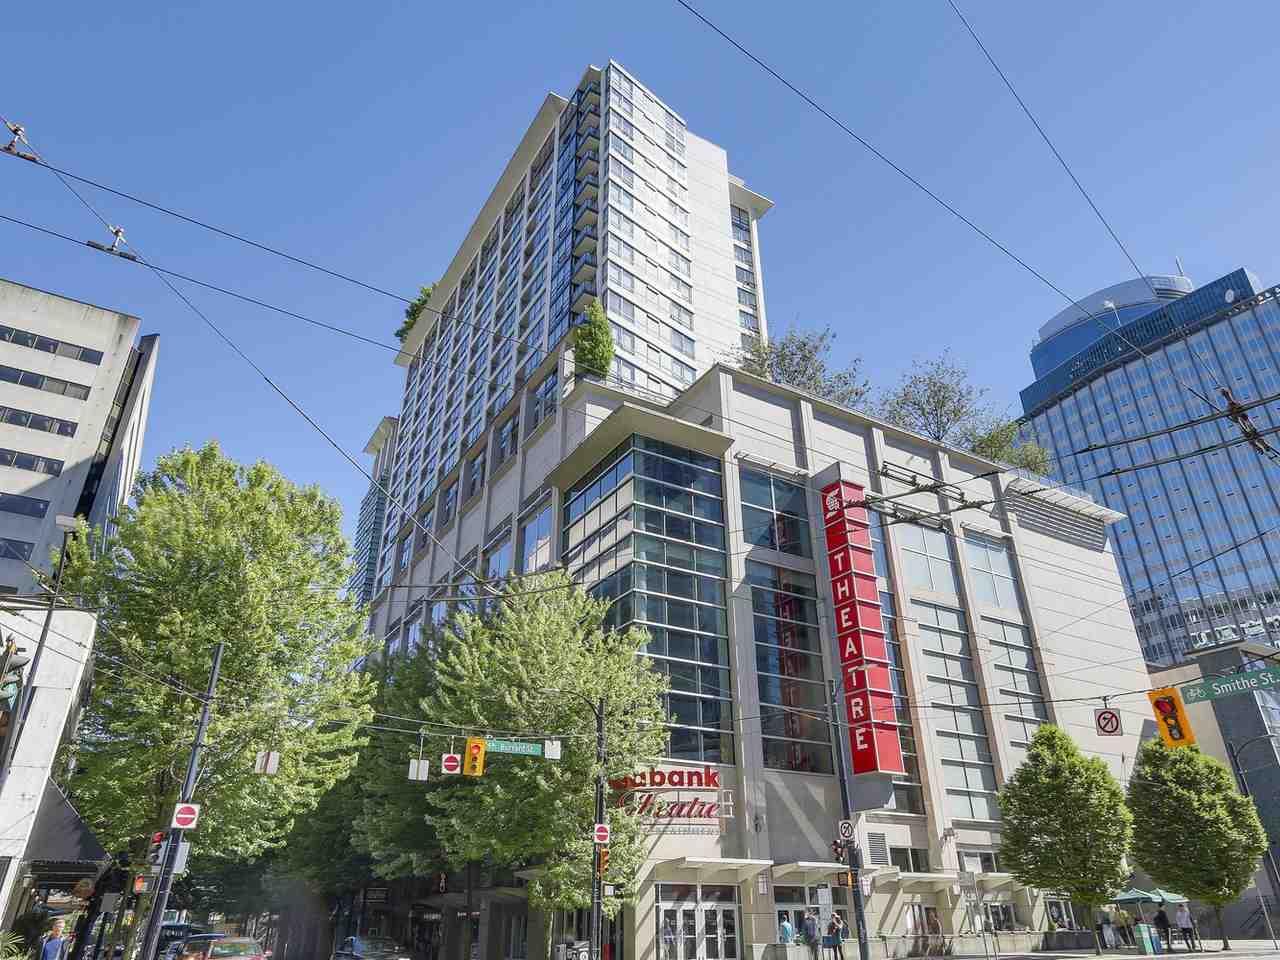 1413 938 SMITHE STREET, Vancouver